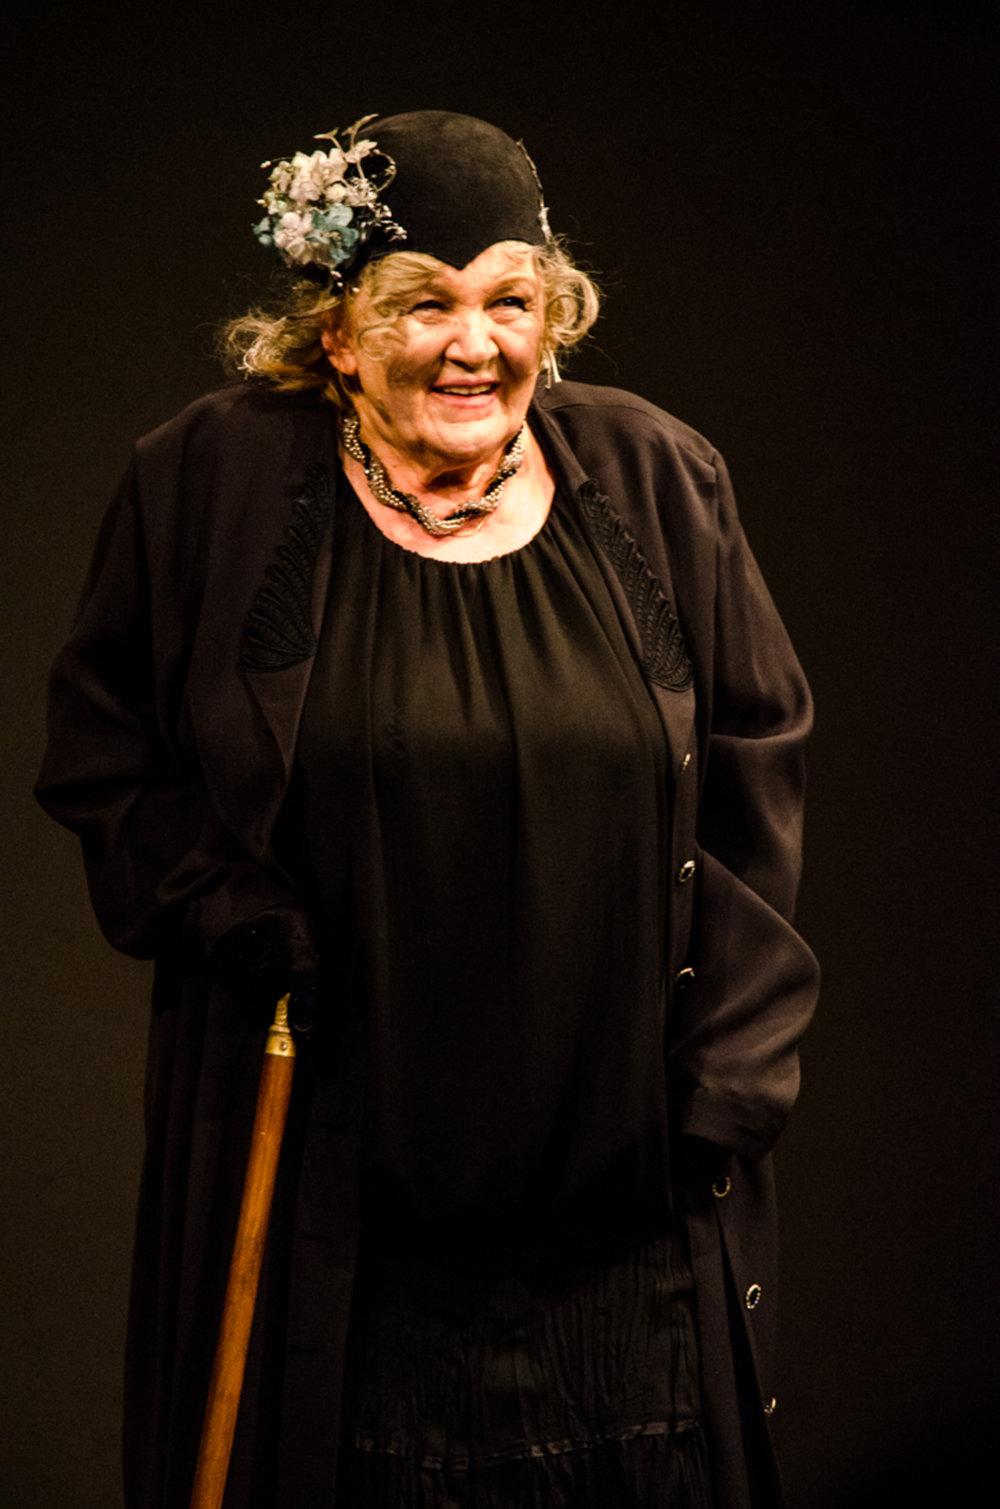 Herečka Zita Furková predvlani účinkovala v slávnostnom programe k 25. výročiu vzniku divadla Astorka Korzo' 90. FOTO TASR - Jakub Kotian